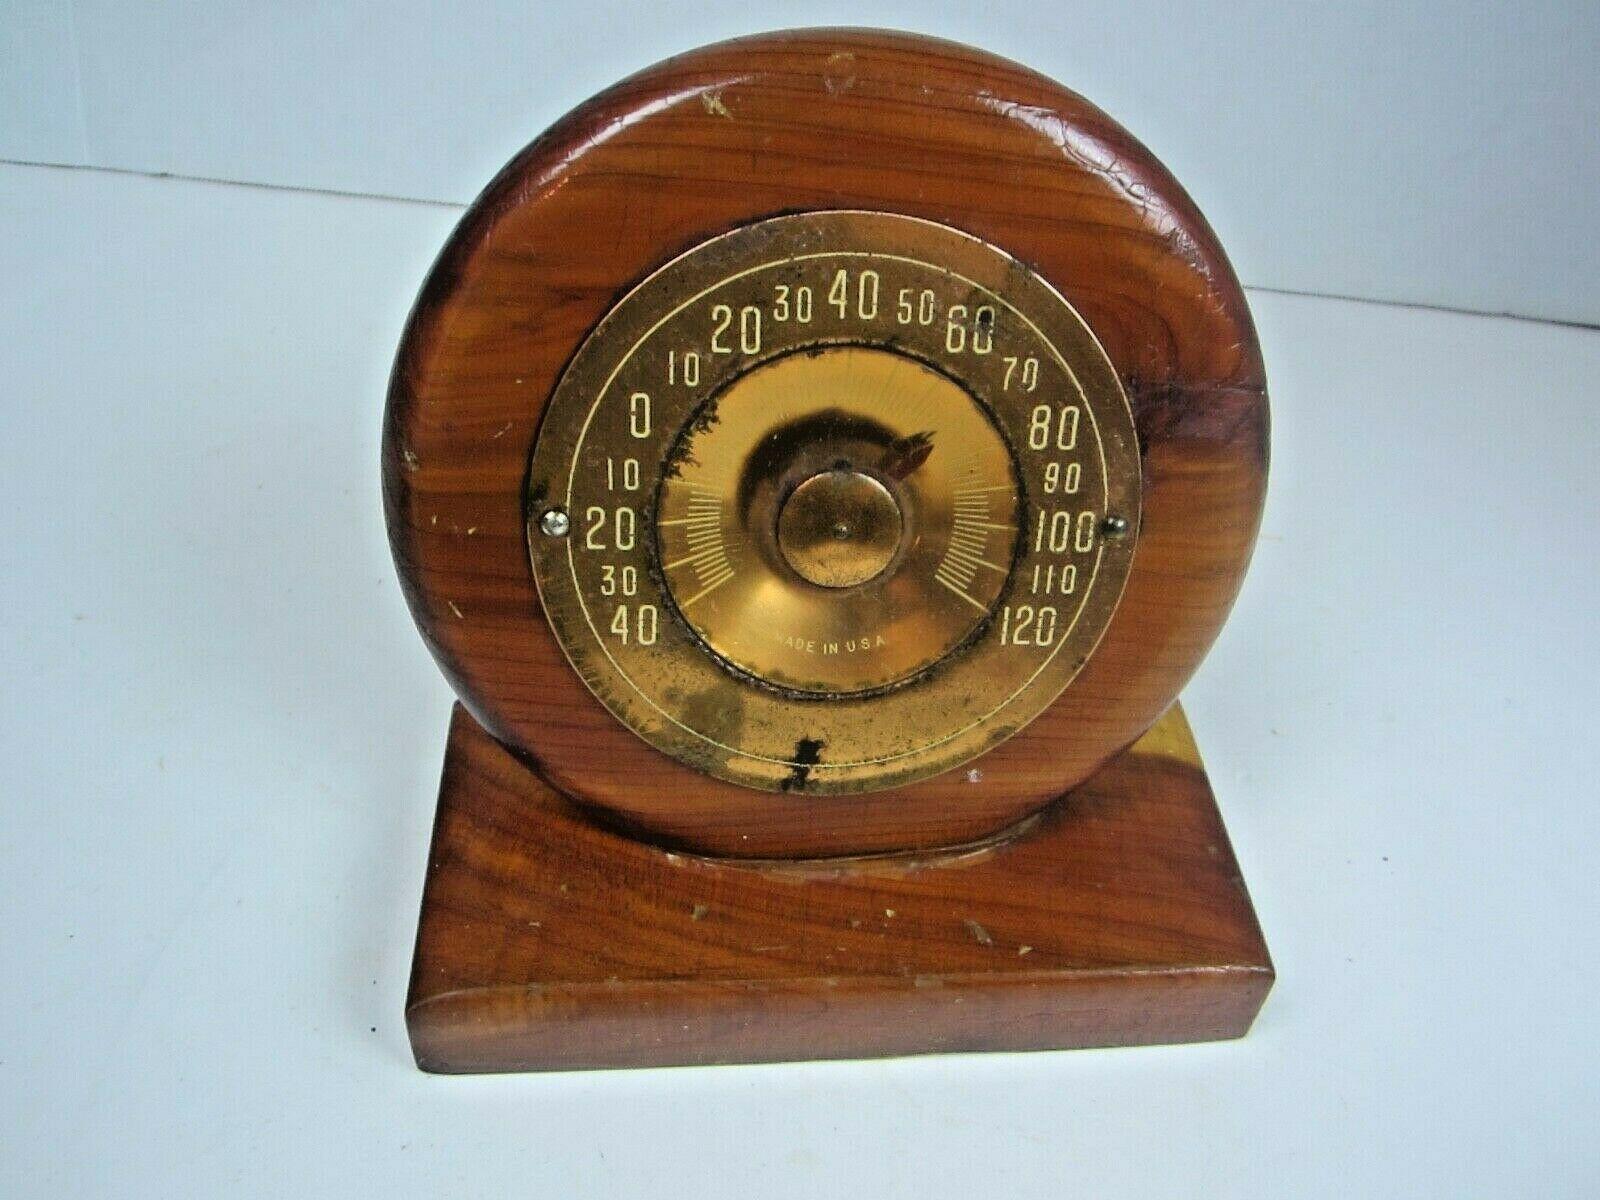 Vintage Raygram Thermometer with Original Tube